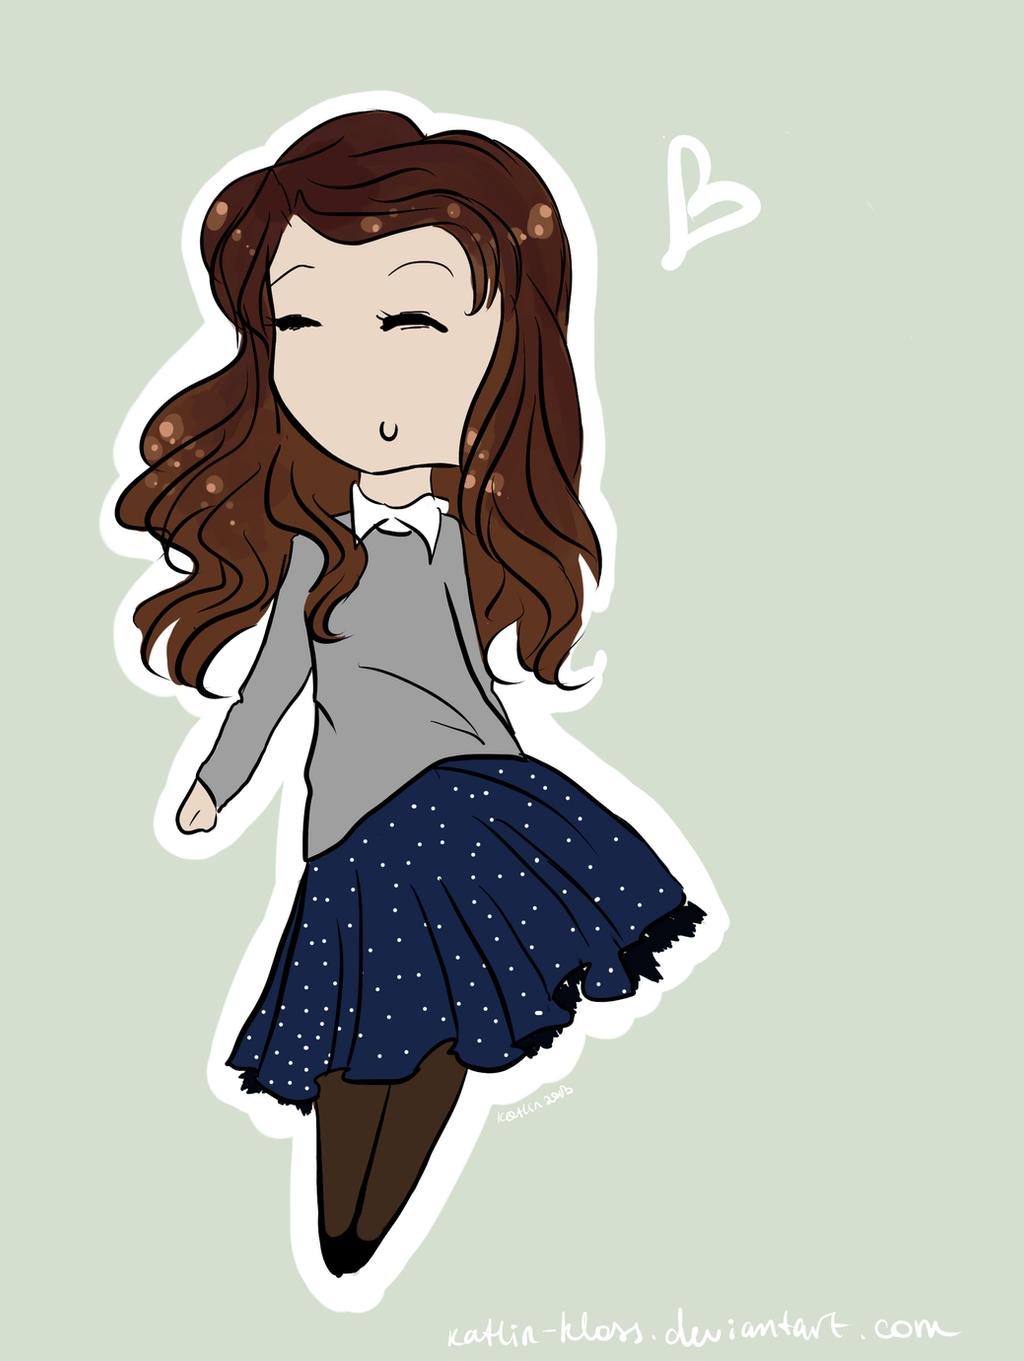 Katlin-Kloss's Profile Picture